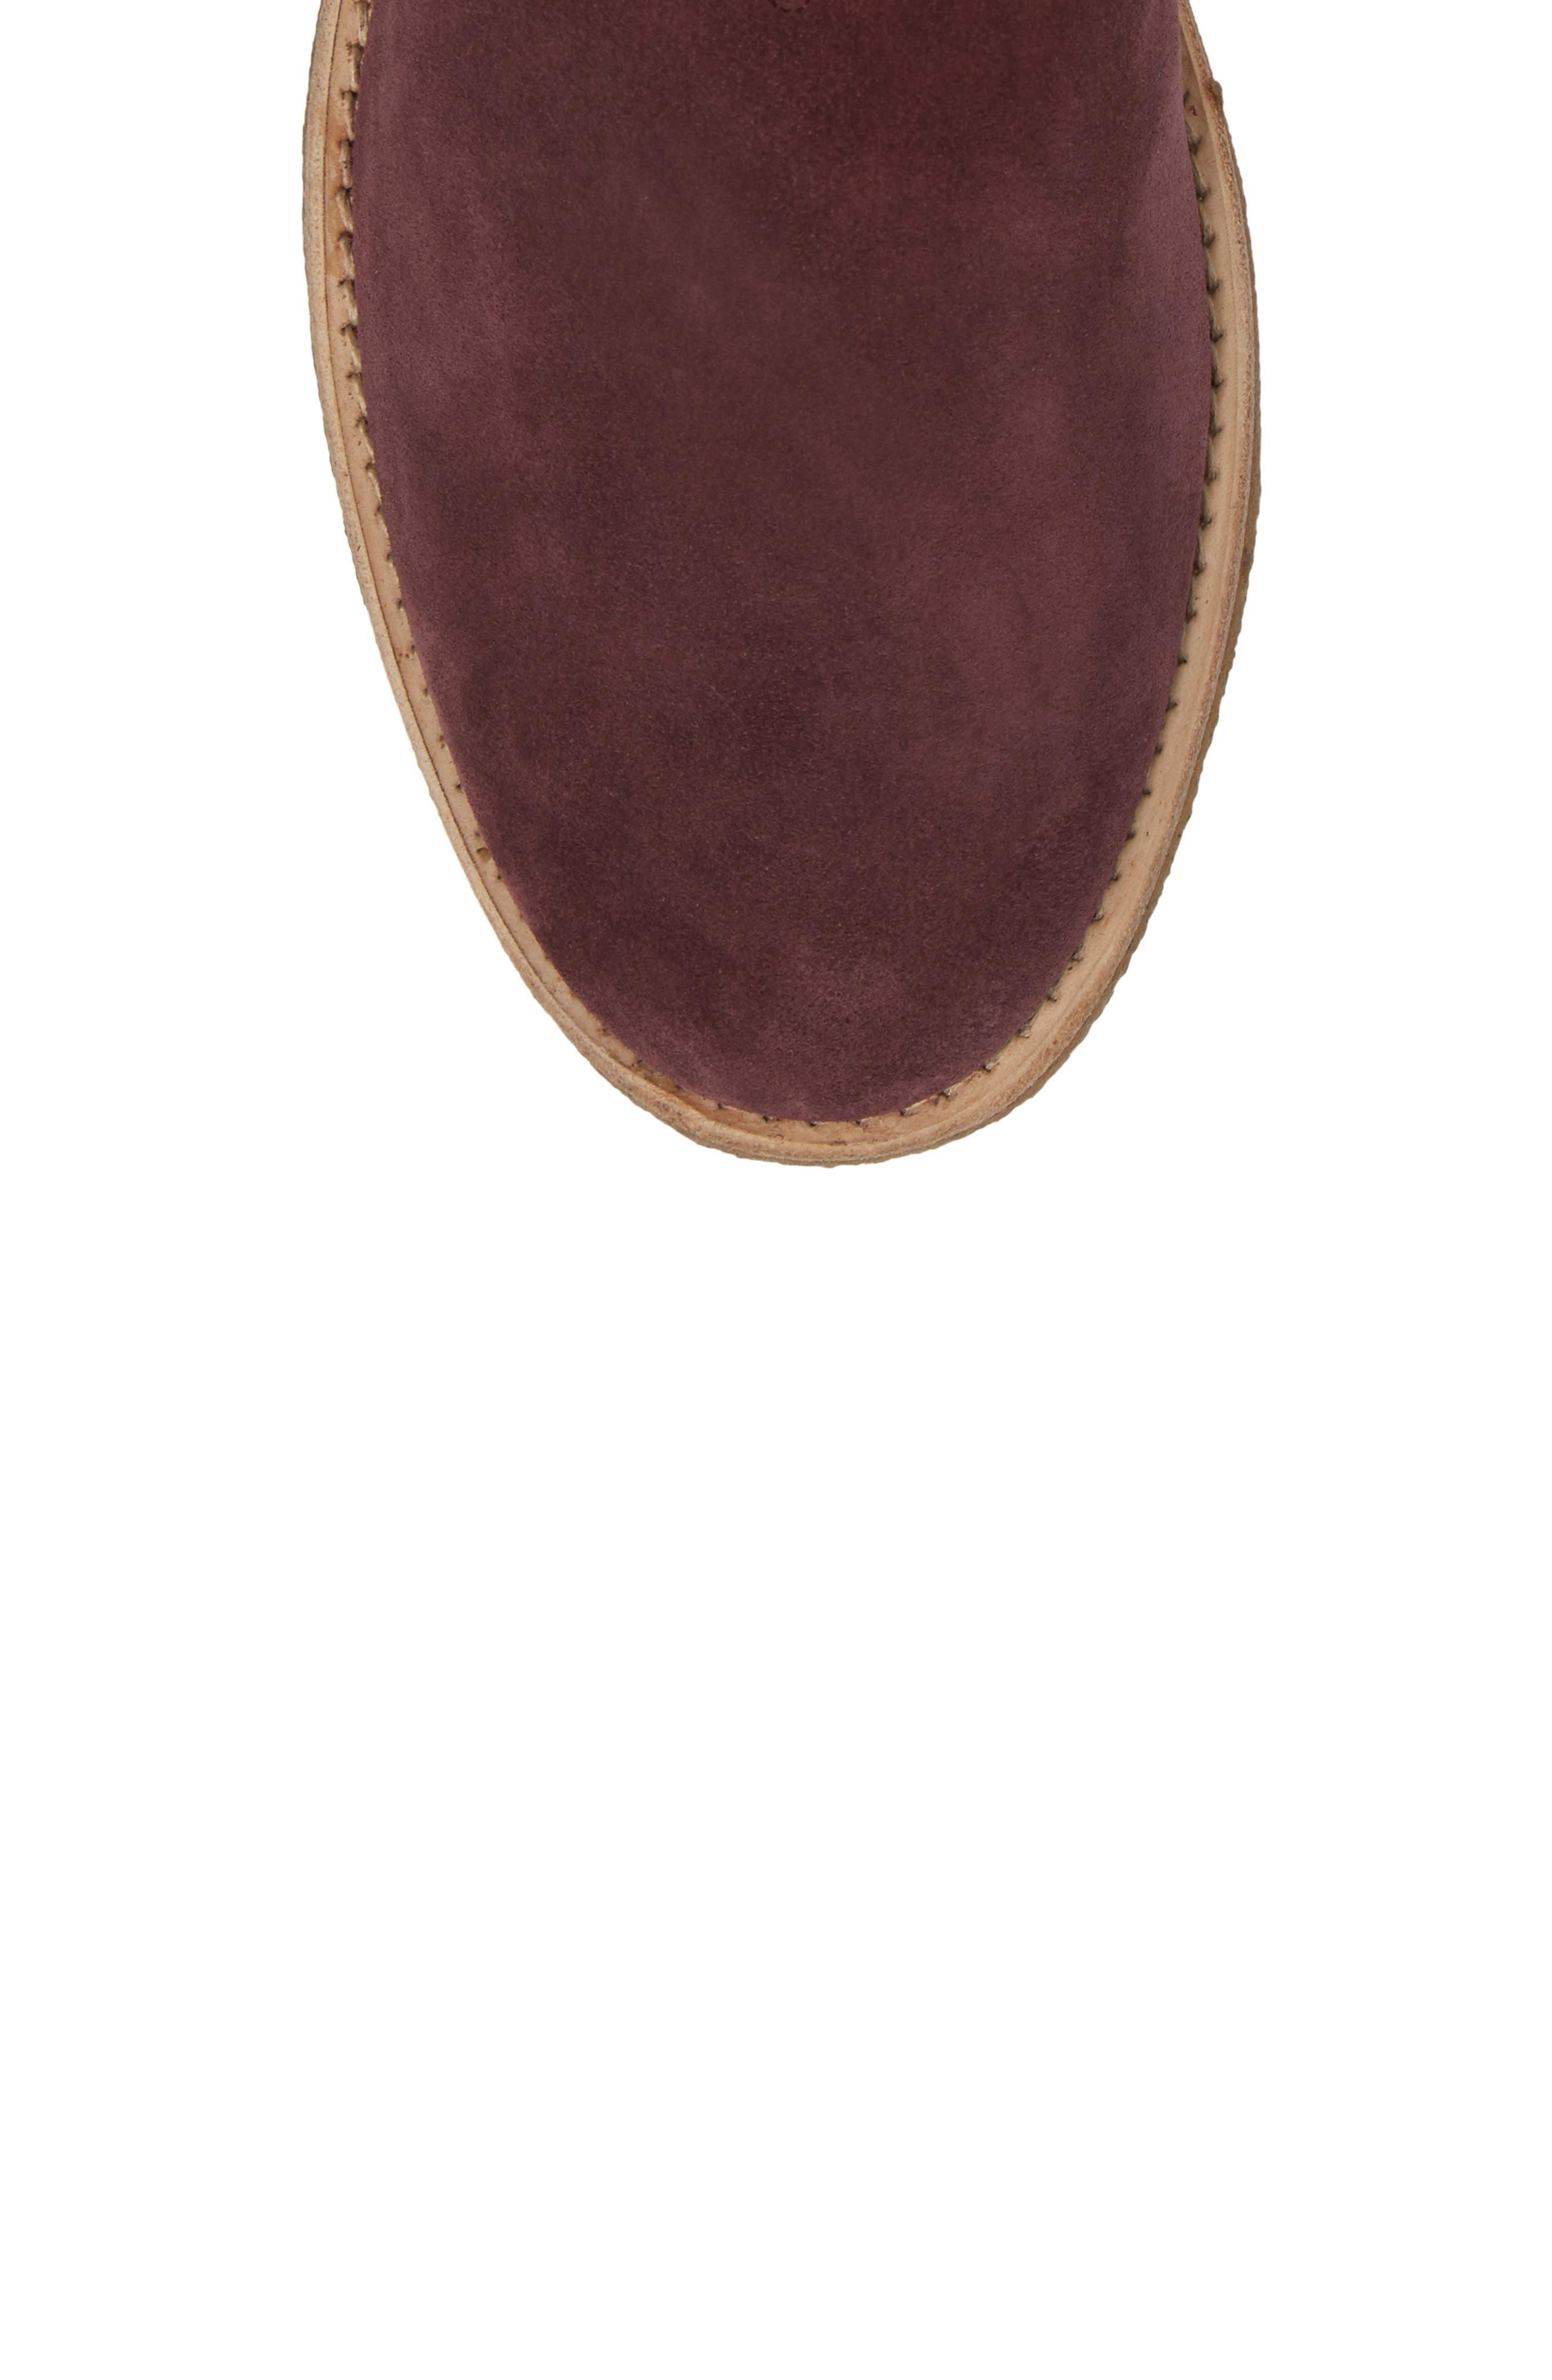 Chelsea Boot,                             Alternate thumbnail 6, color,                             Prunga Burgundy